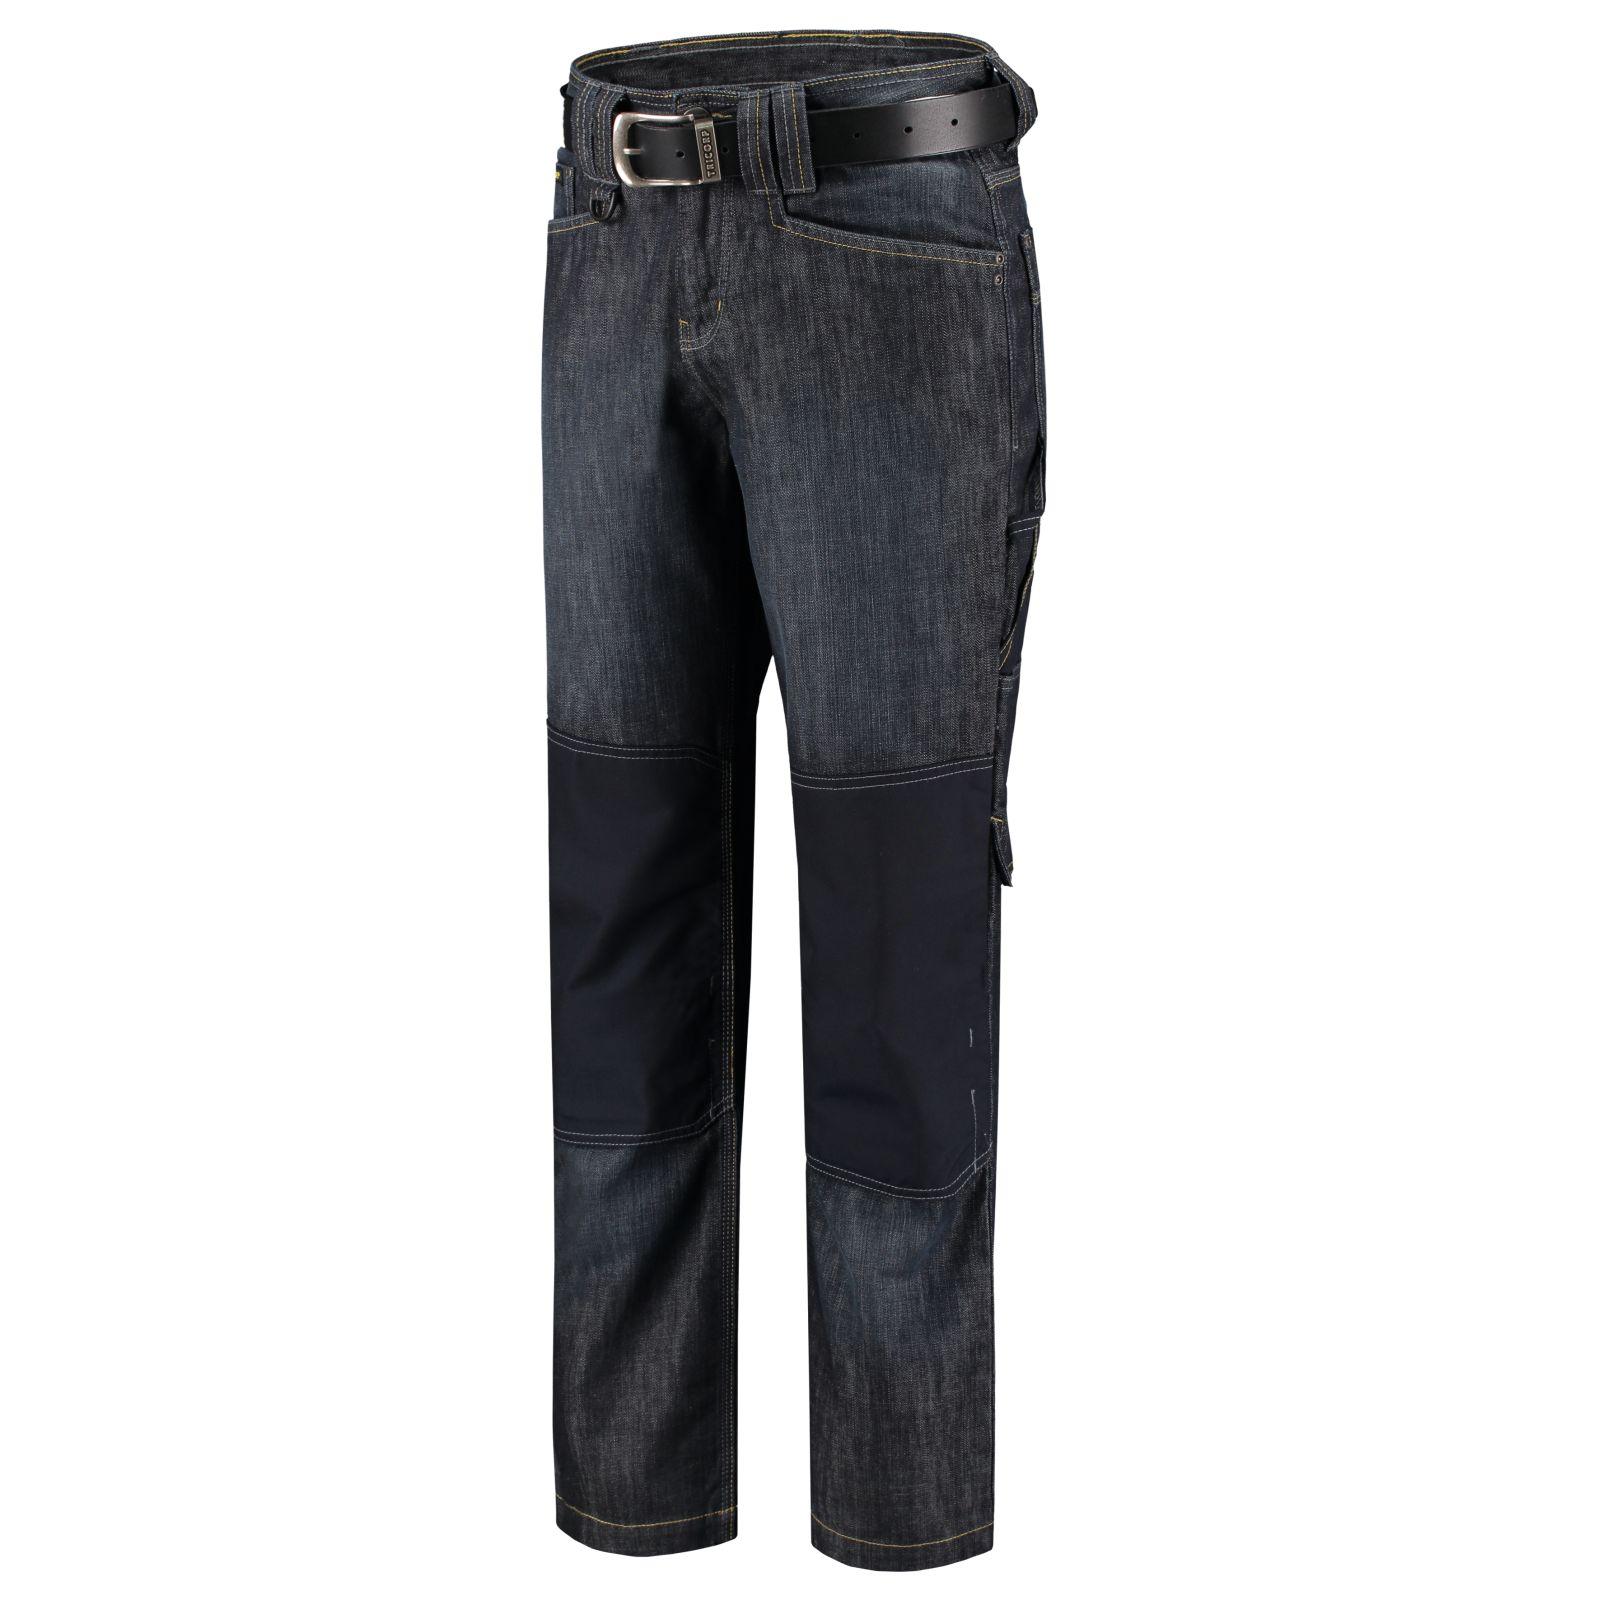 Tricorp Workwear Broeken 502005-TJW2000 Jeans denim blue(Denimblue)